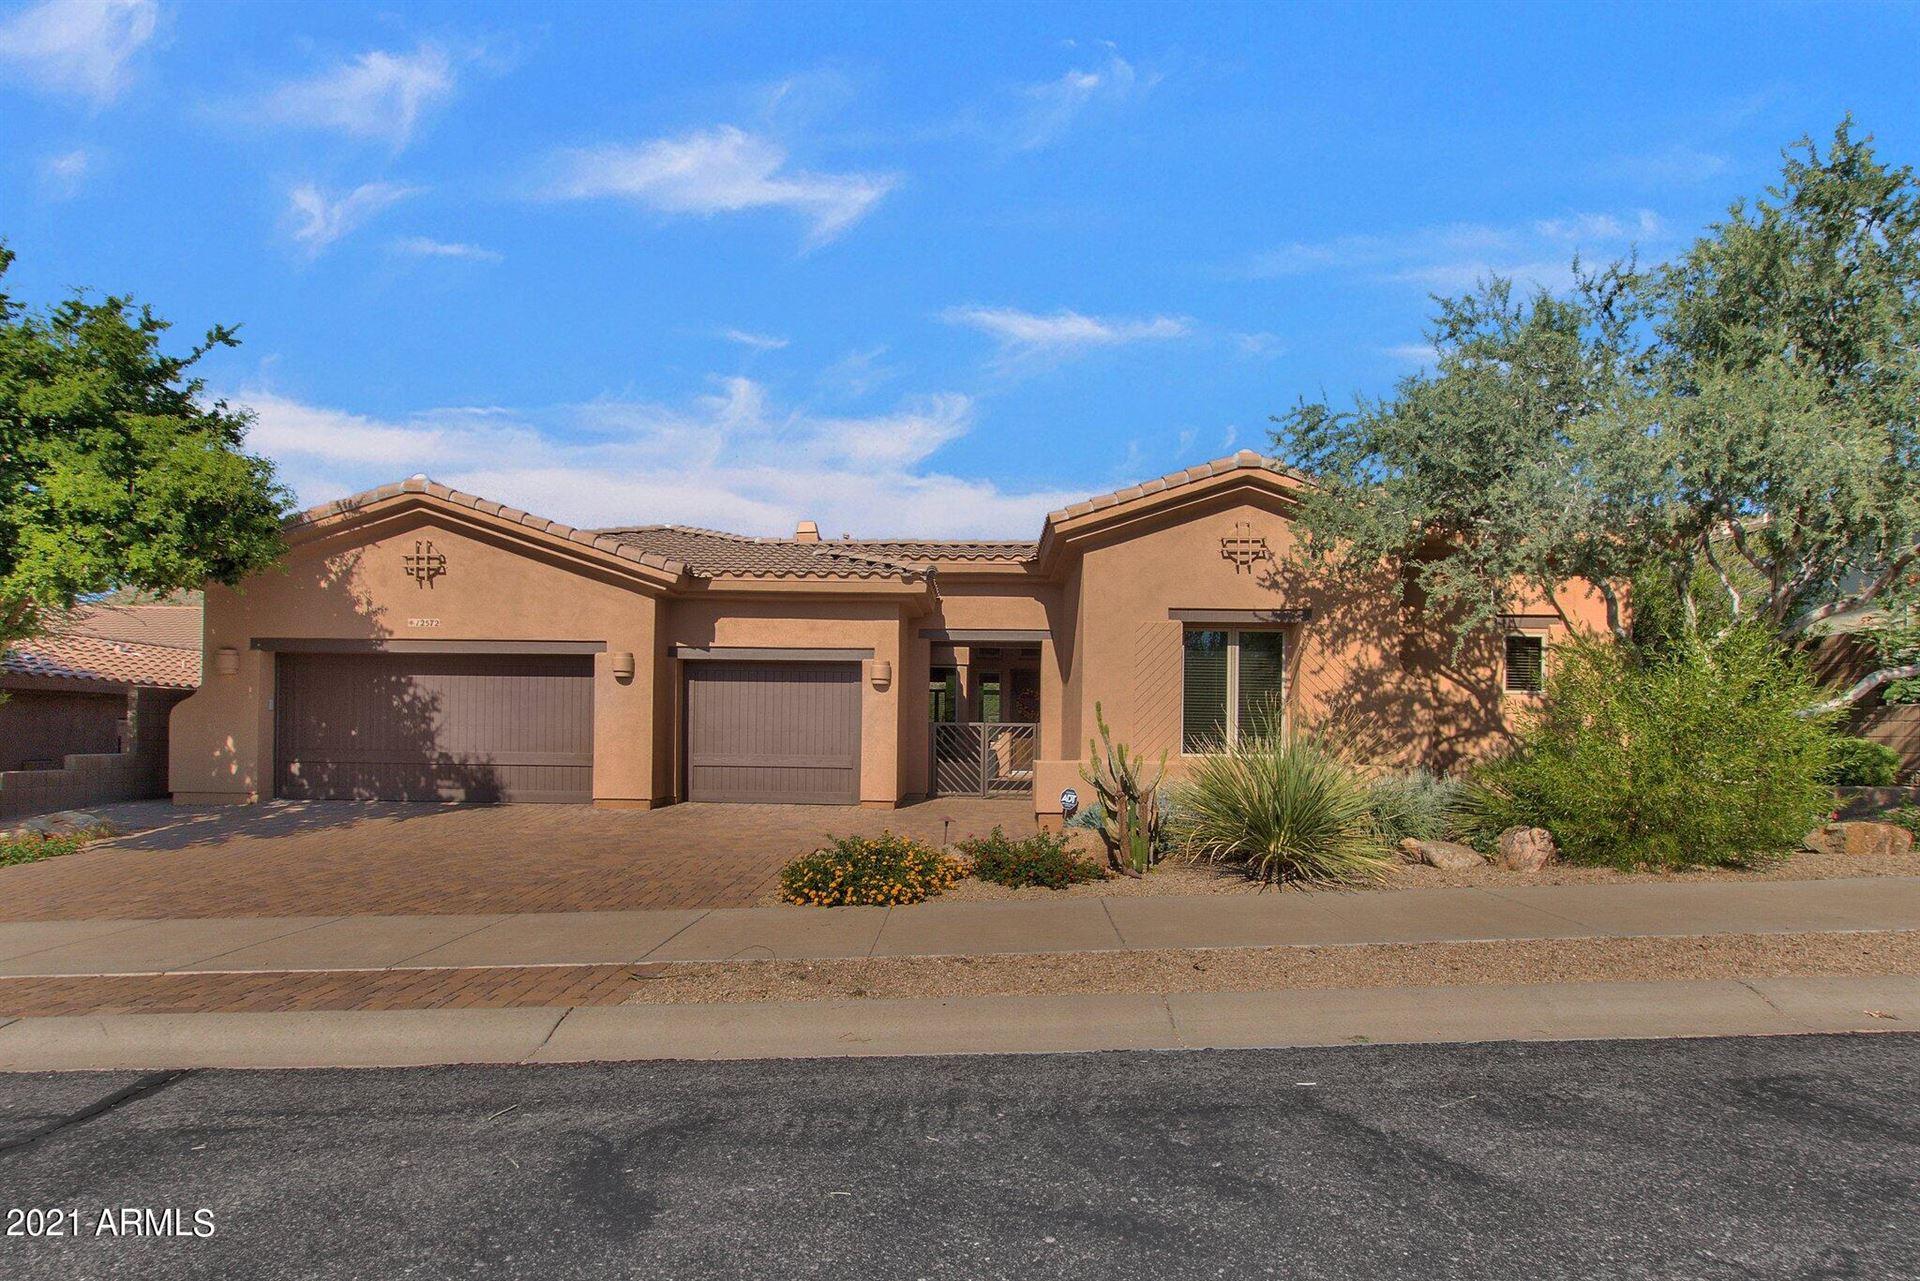 Photo of 12572 N 145TH Way, Scottsdale, AZ 85259 (MLS # 6306165)